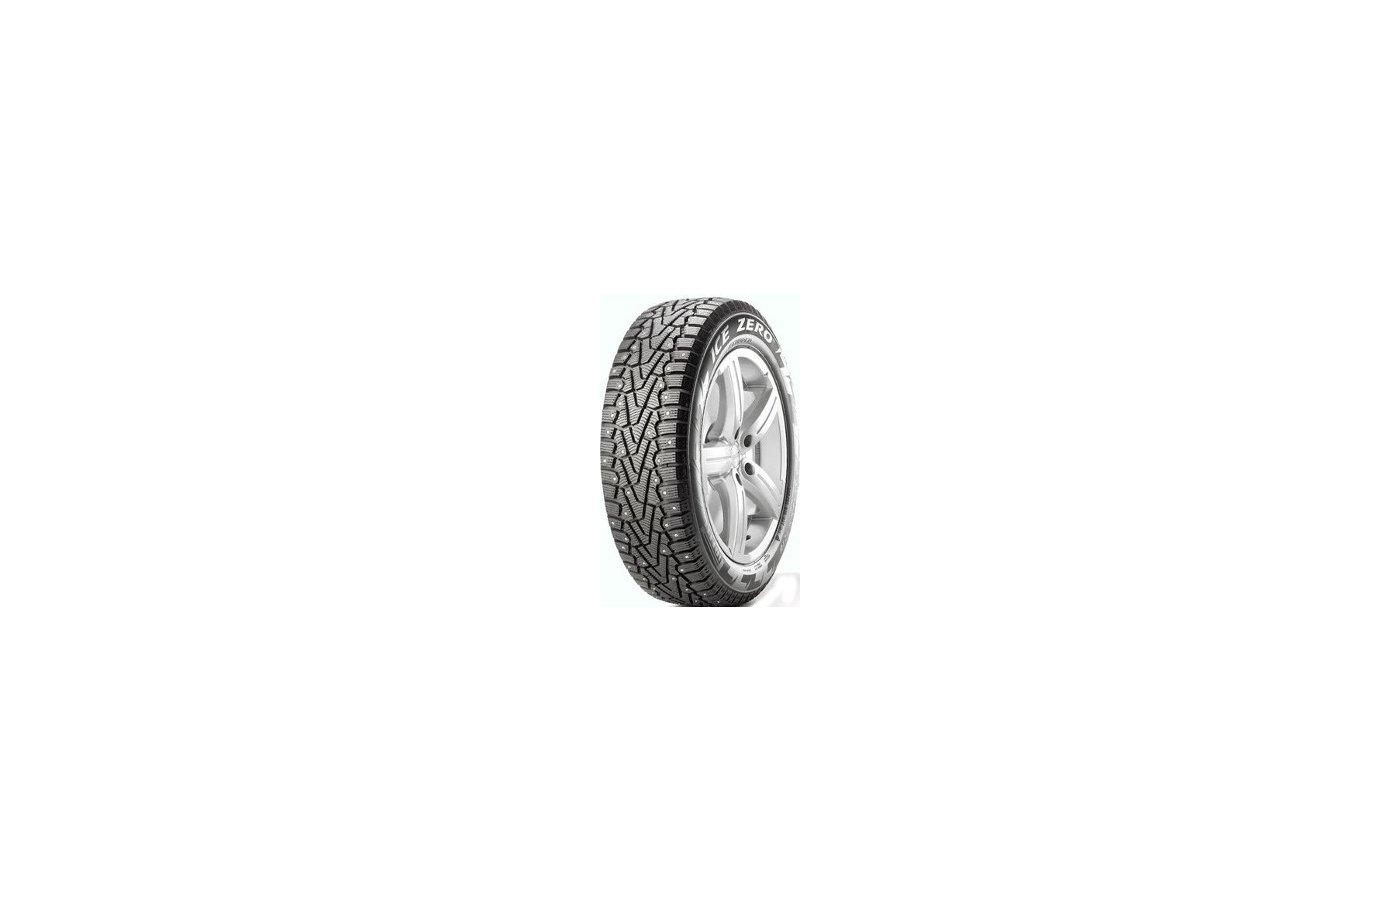 Шина Pirelli Ice Zero 195/55 R16 TL 91T XL шип